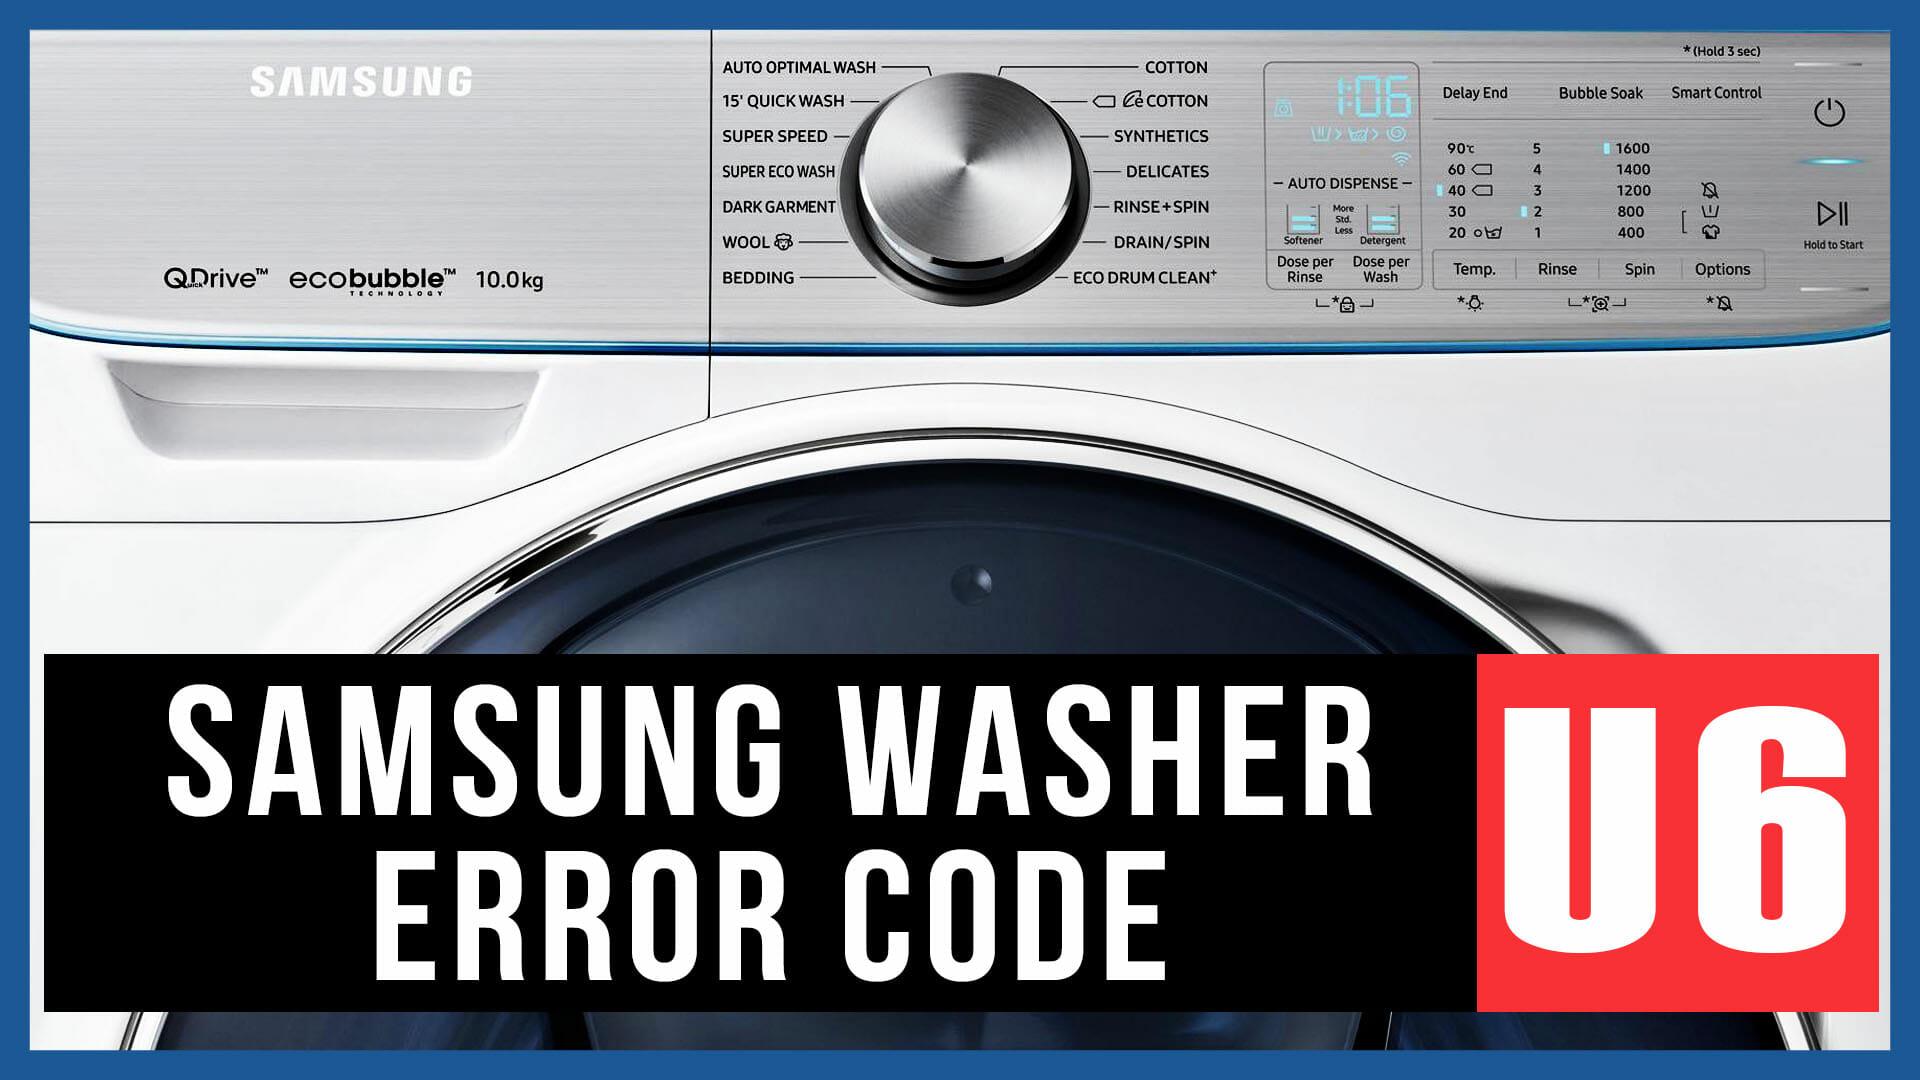 Samsung washer error code U6 | Causes, How FIX Problem